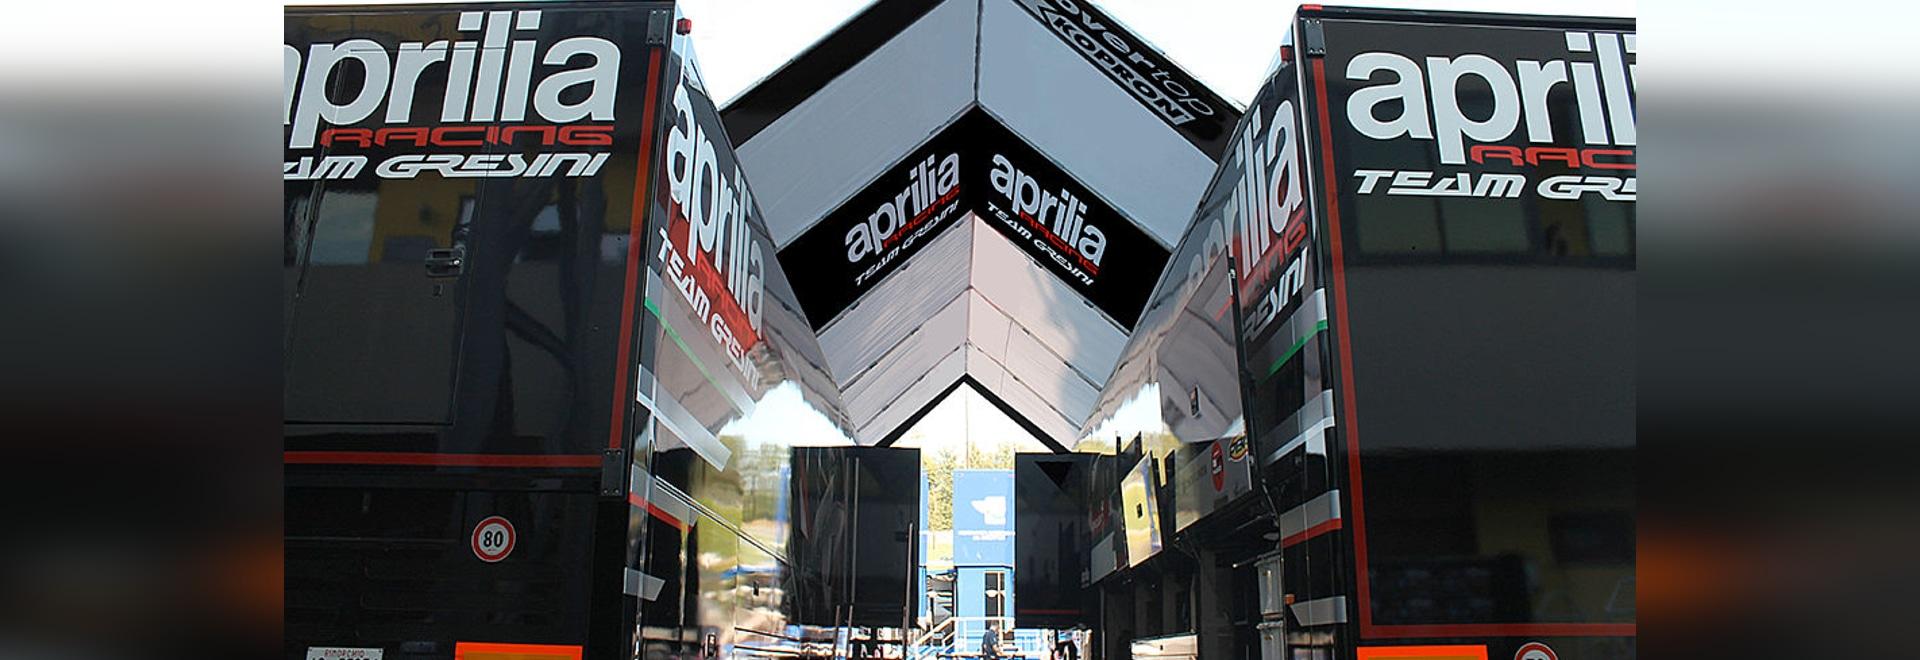 Kopron erneuert Partnership mit Gresini Racing und baut neue Kovertop.